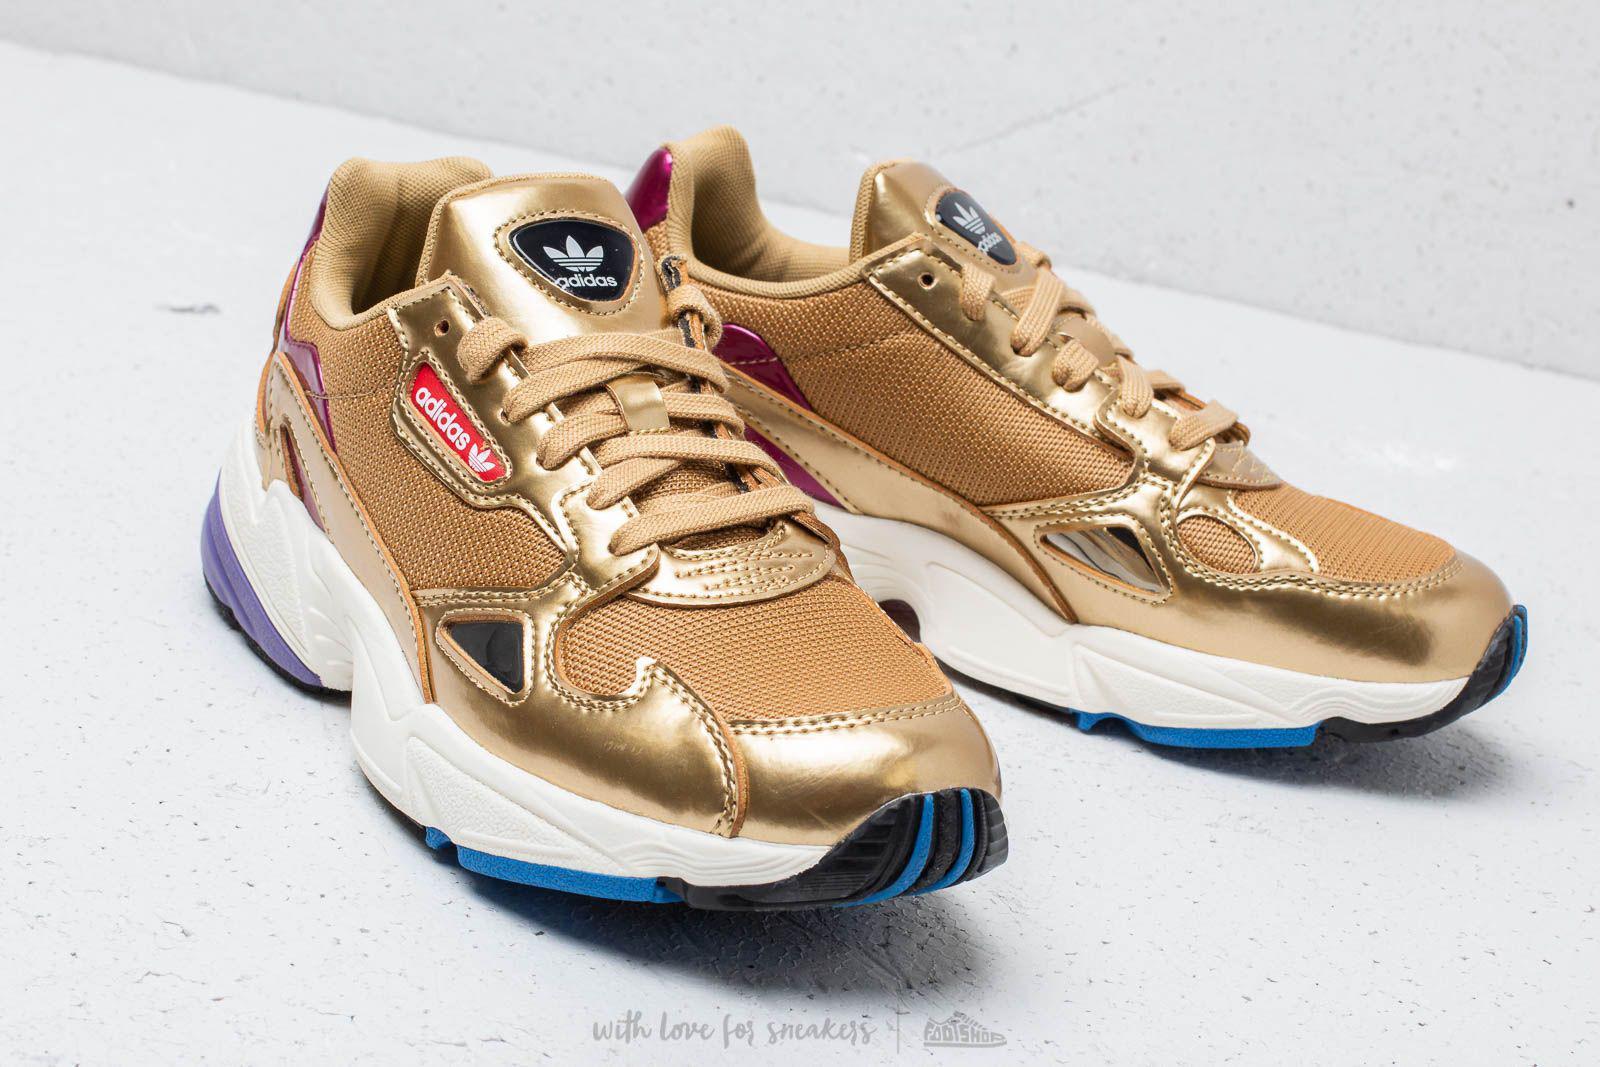 on sale aed6c 92333 Lyst - adidas Originals Adidas Falcon W Gold Metallic Gold M